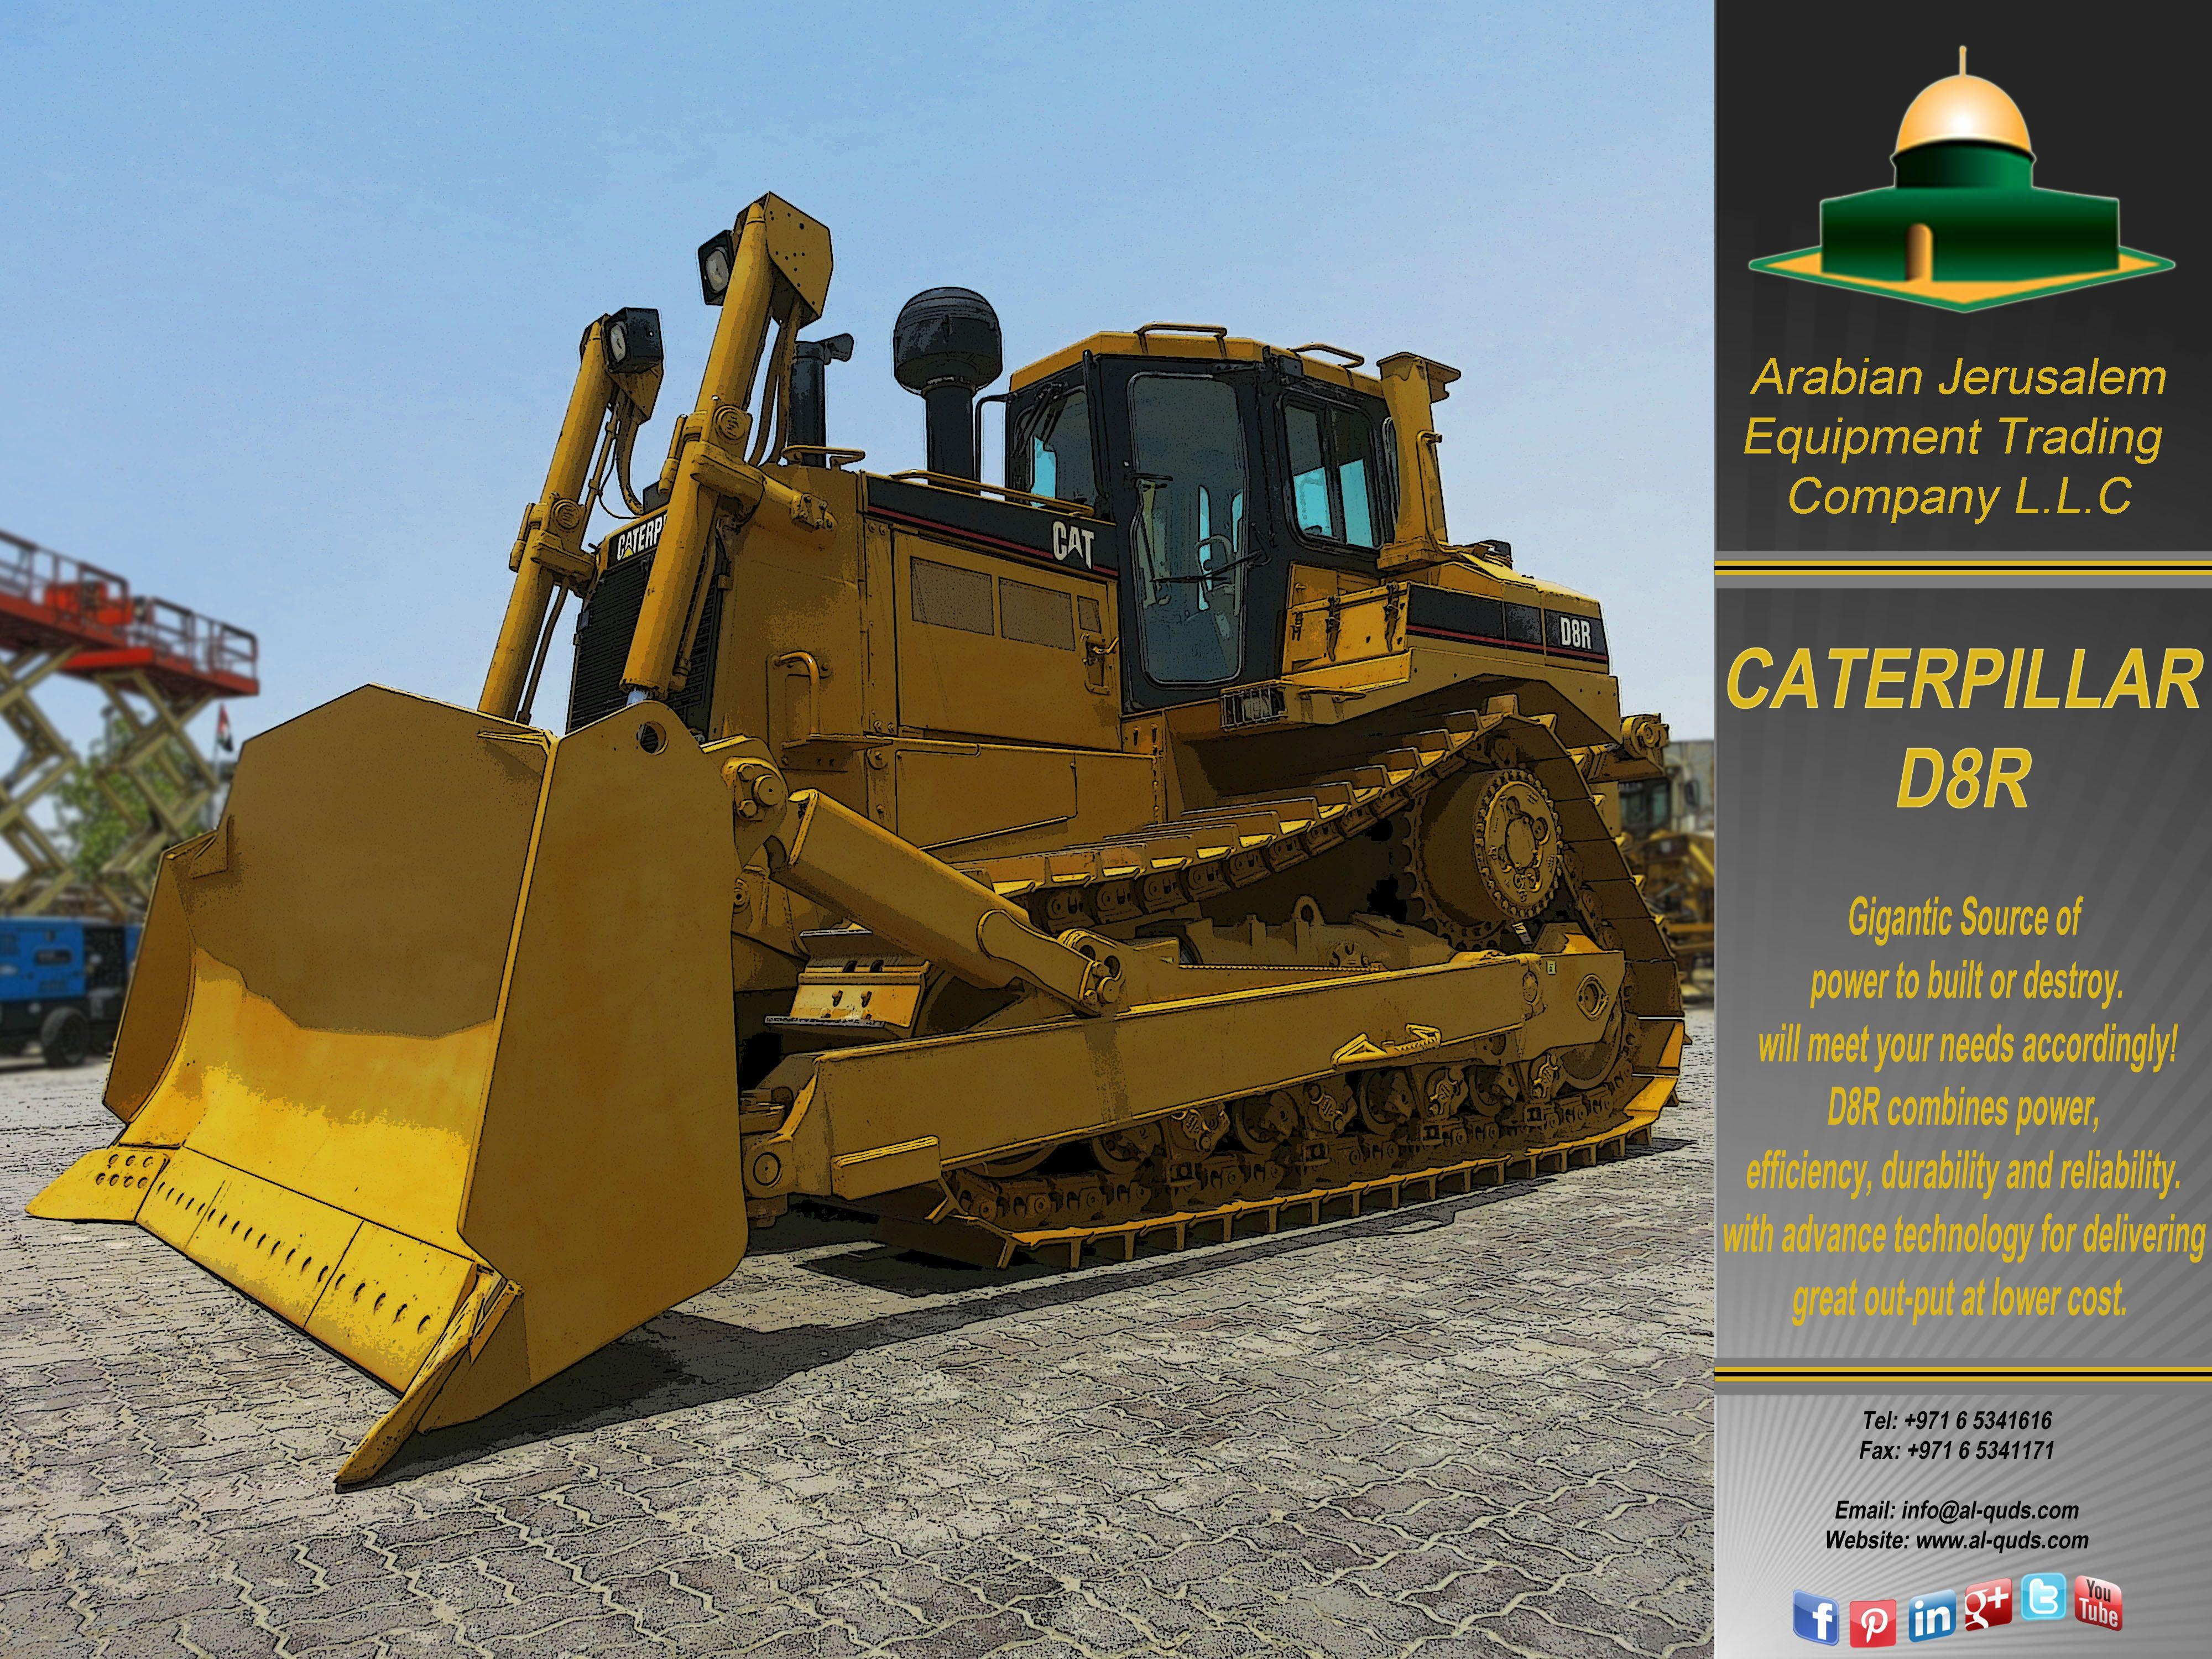 Pin by Arabian Jerusalem Equipment Trading Company on DOZER